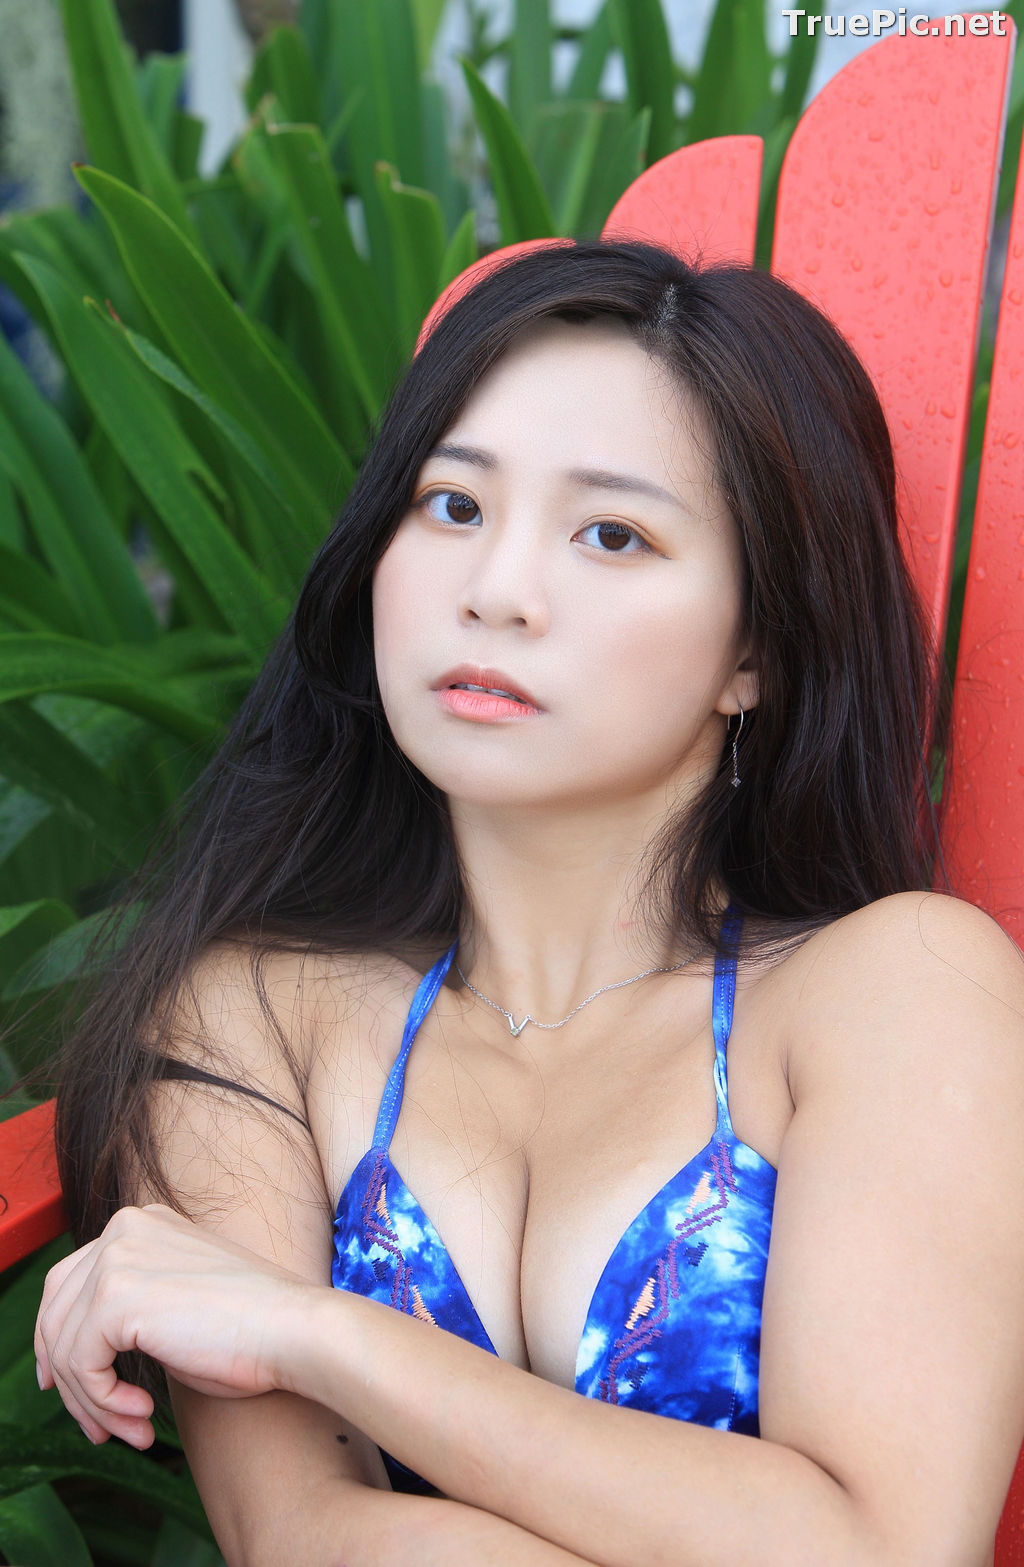 Image Taiwanese Model - Shelly - Beautiful Bodybuilding Bikini Girl - TruePic.net - Picture-81